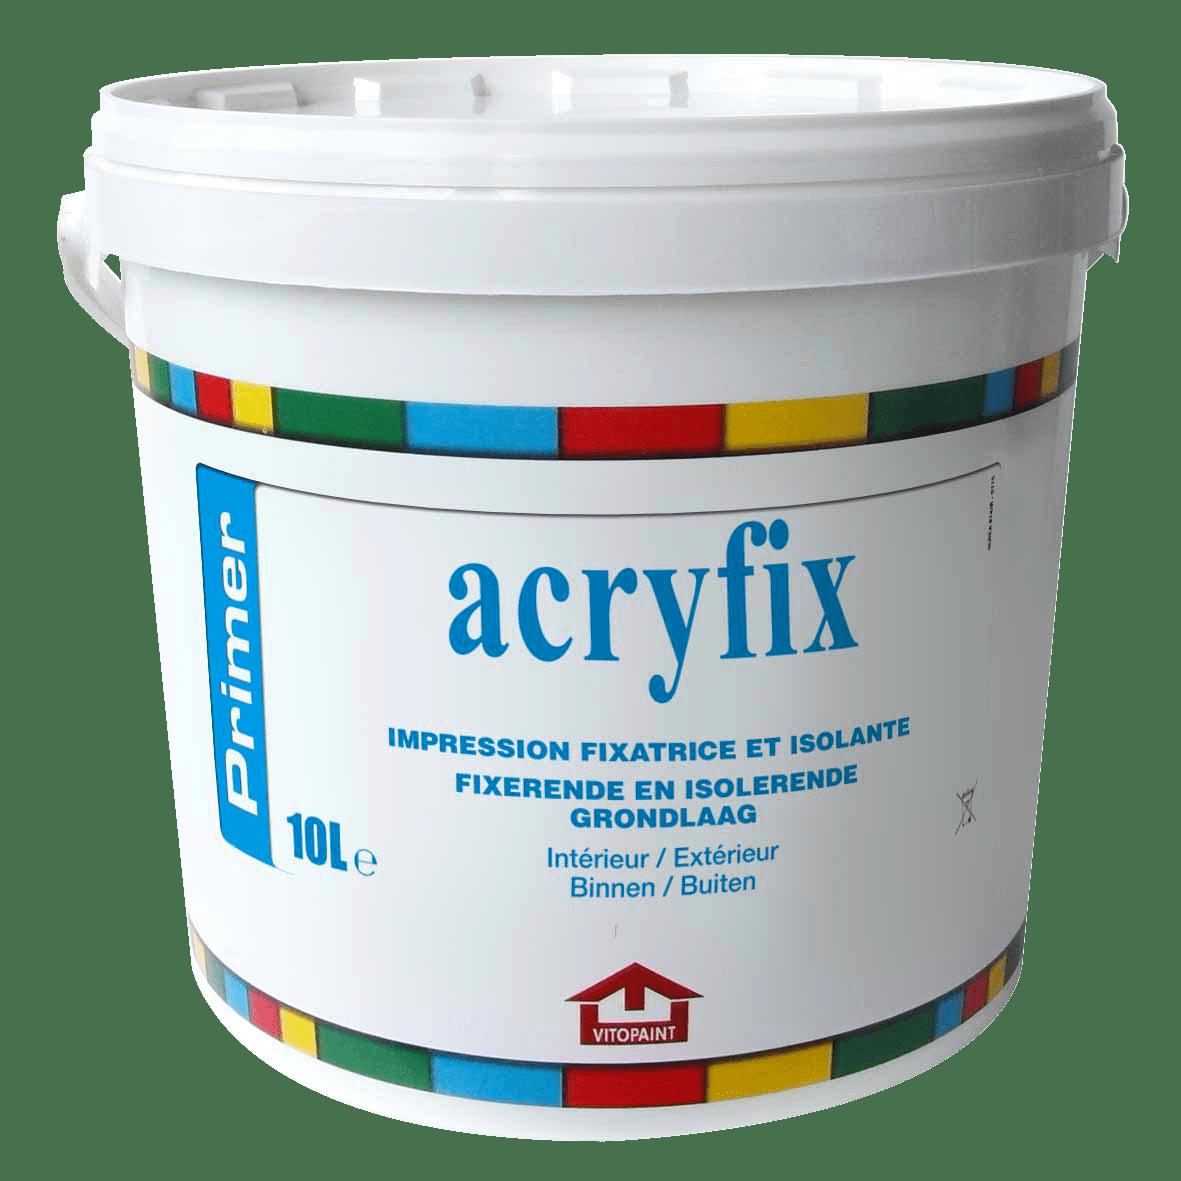 Acryfix